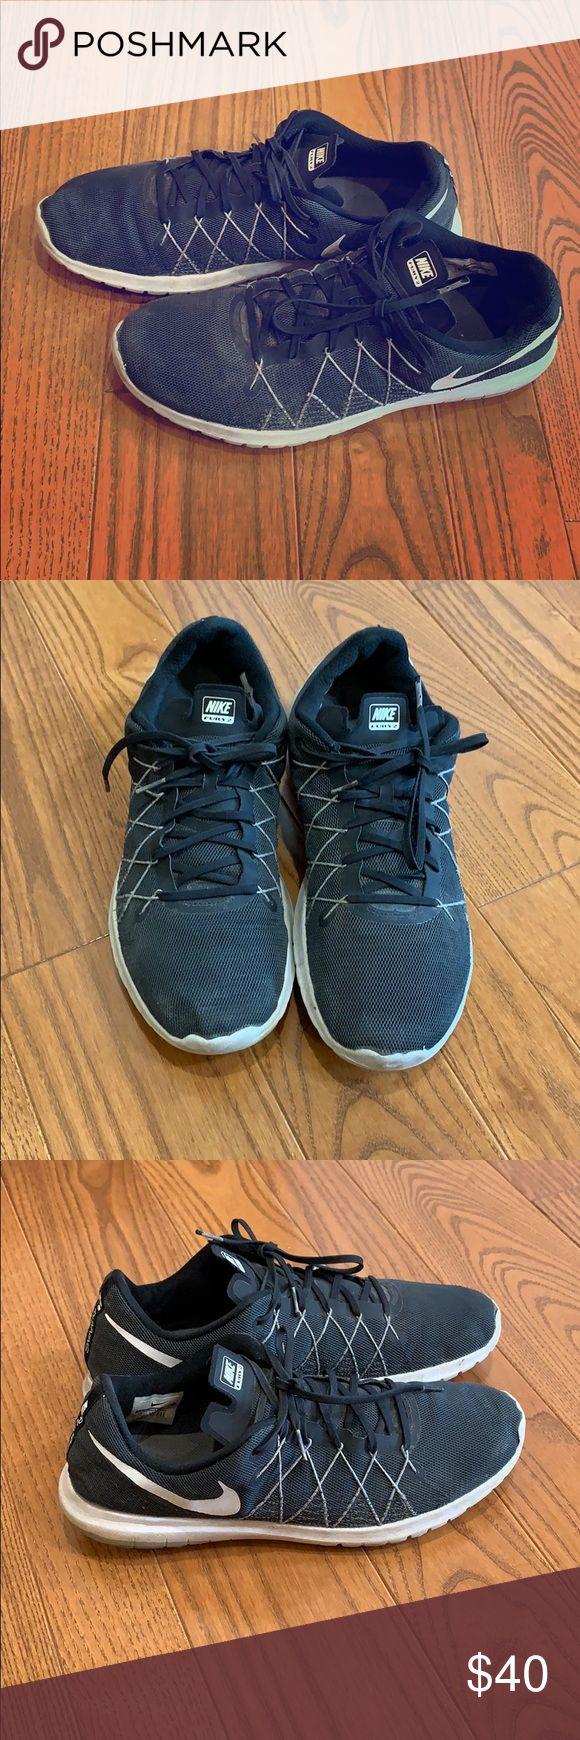 Men's Nike Fury 2 Running Sneakers- Nike Flex Gently used Men's Nike Fury 2 Running Sneakers- Nike Flex. Very comfortable, great for running, walk…